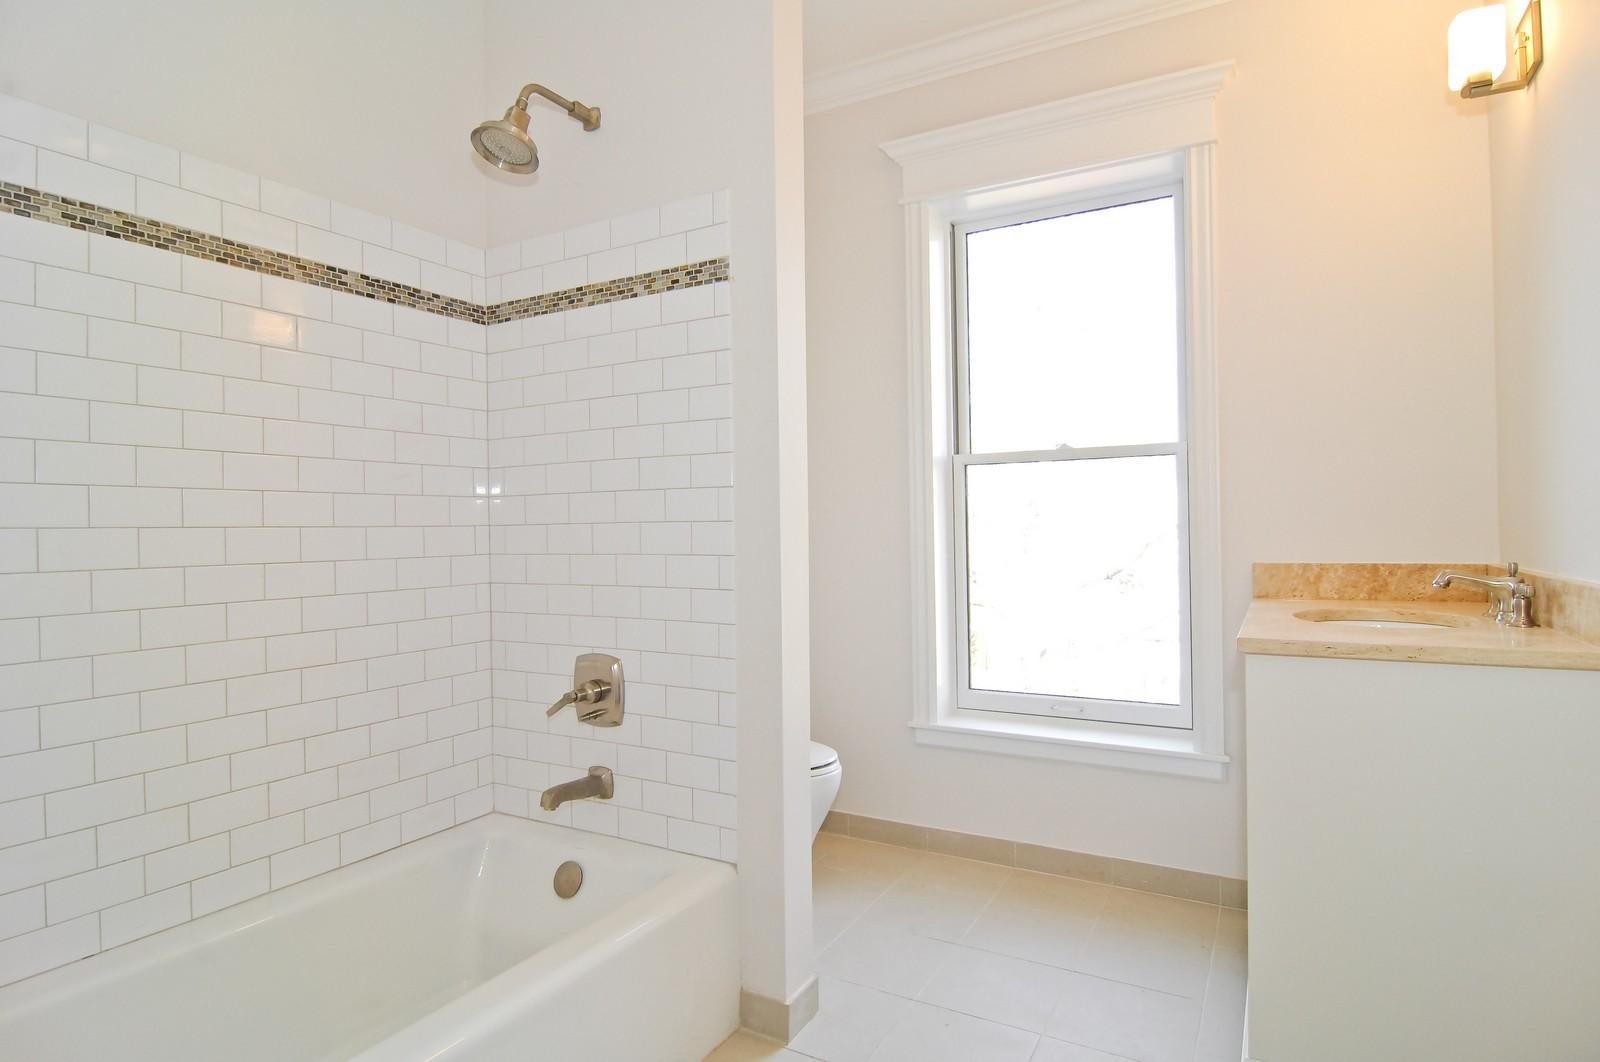 Real Estate Photography - 1845 W. Newport, Chicago, IL, 60657 - Location 1